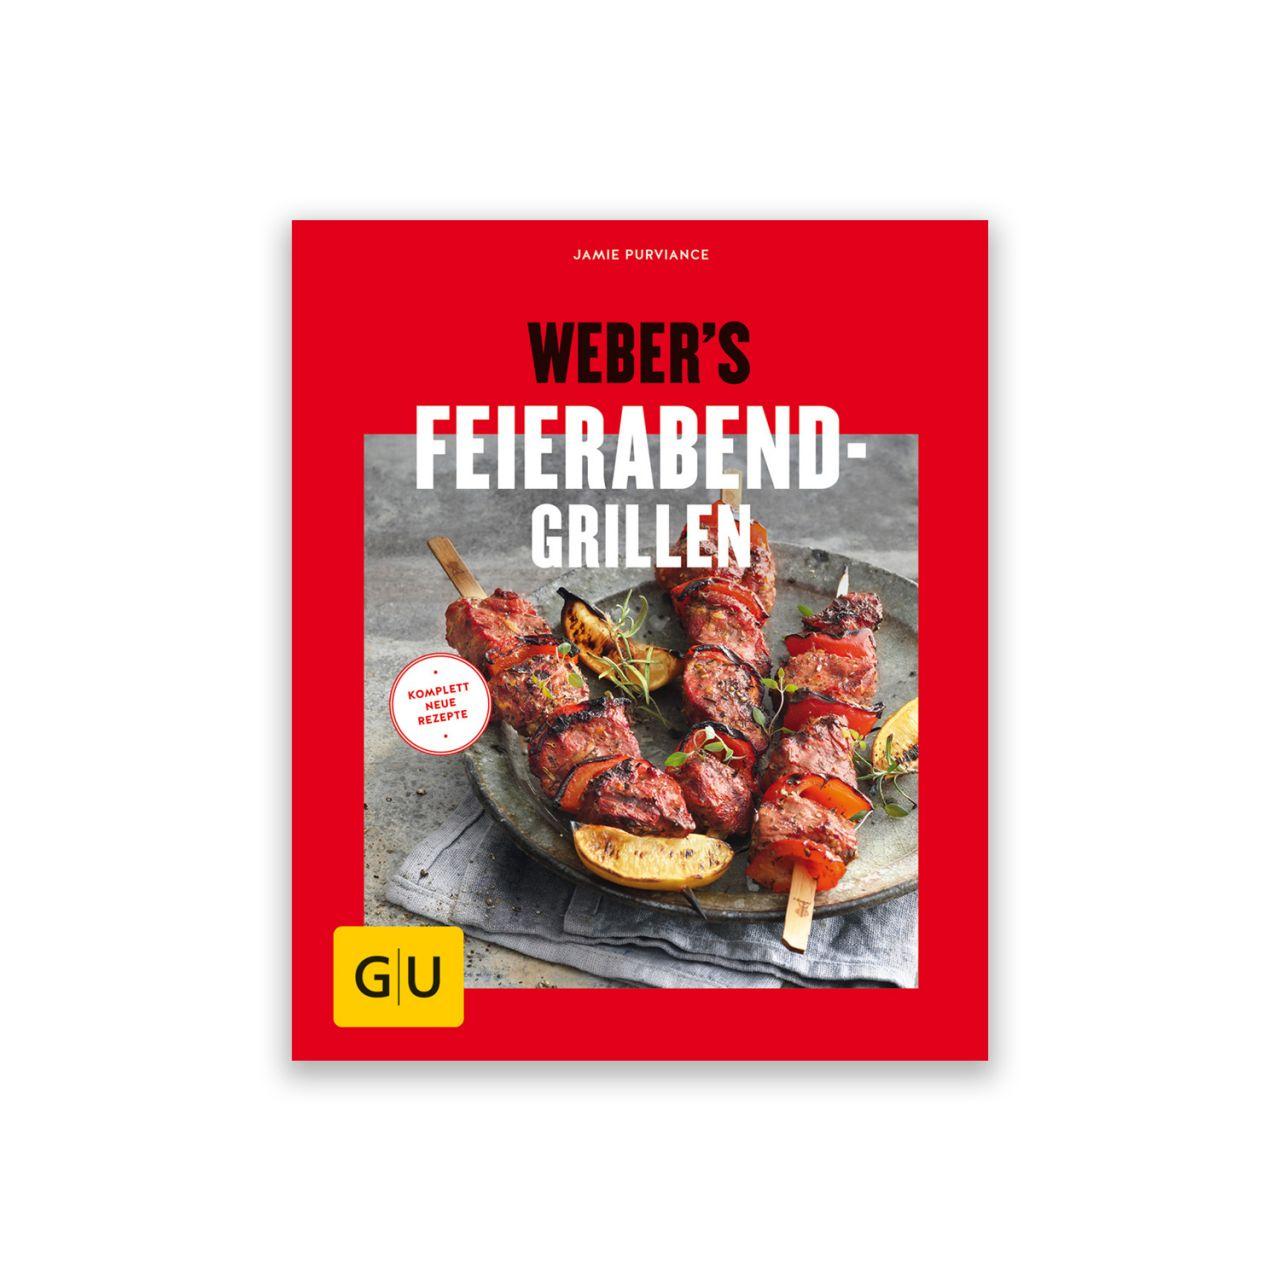 Grillbuch Weber's Feierabend Grillen 978-3-8338-6538-1